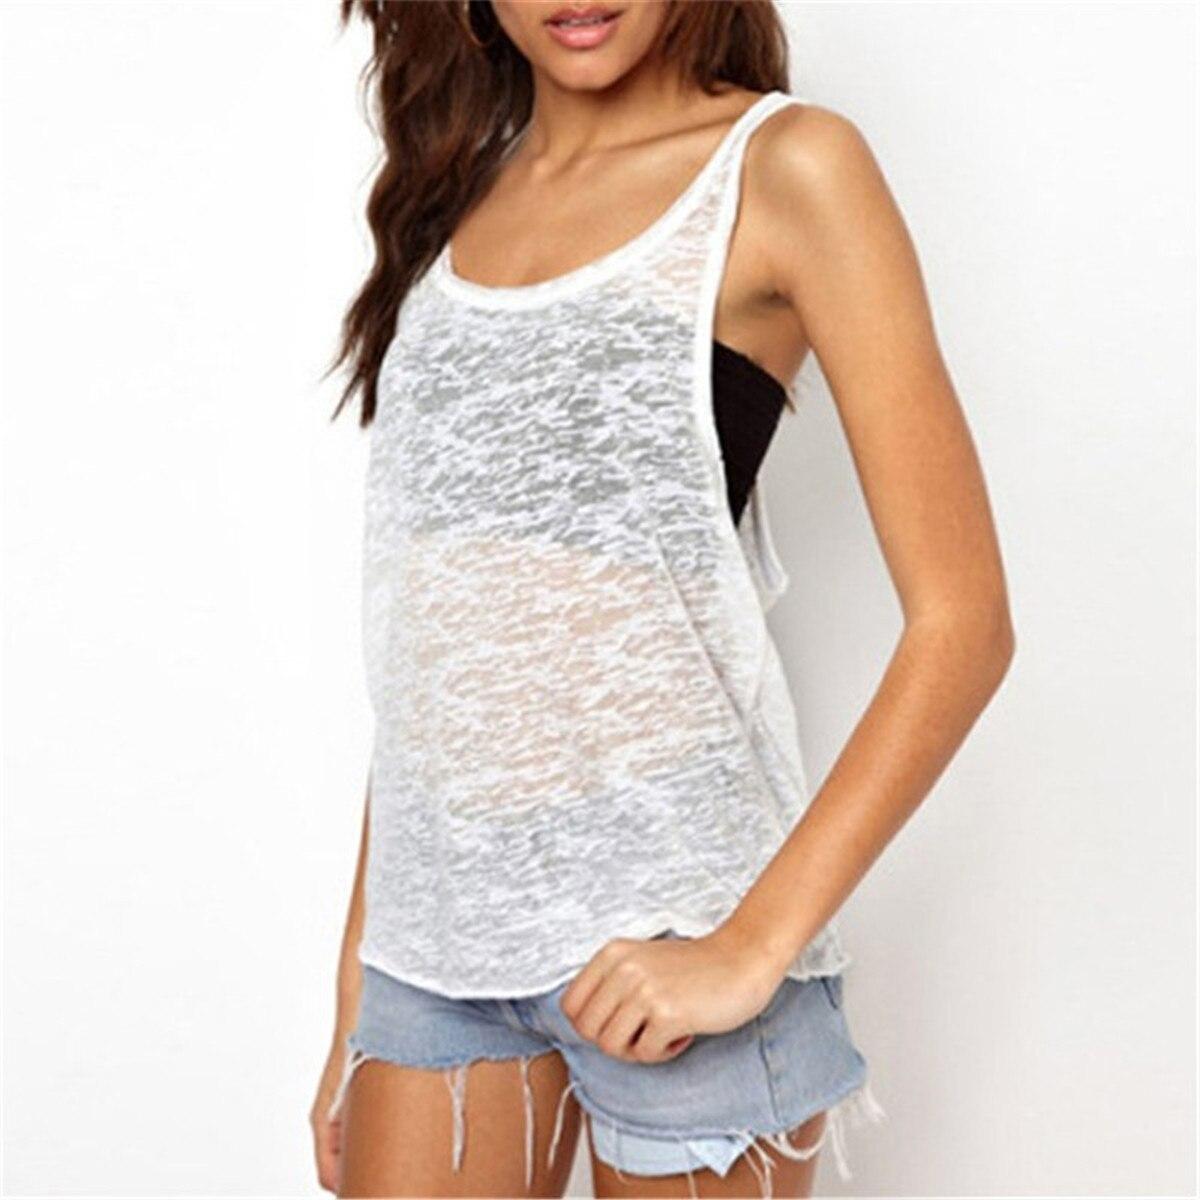 2018 Summer Sexy Women See Through   Tank     Tops   Fashion Sleeveless O Neck Loose Vest   Top   Black White Casual Shirt Plus Size Blusas